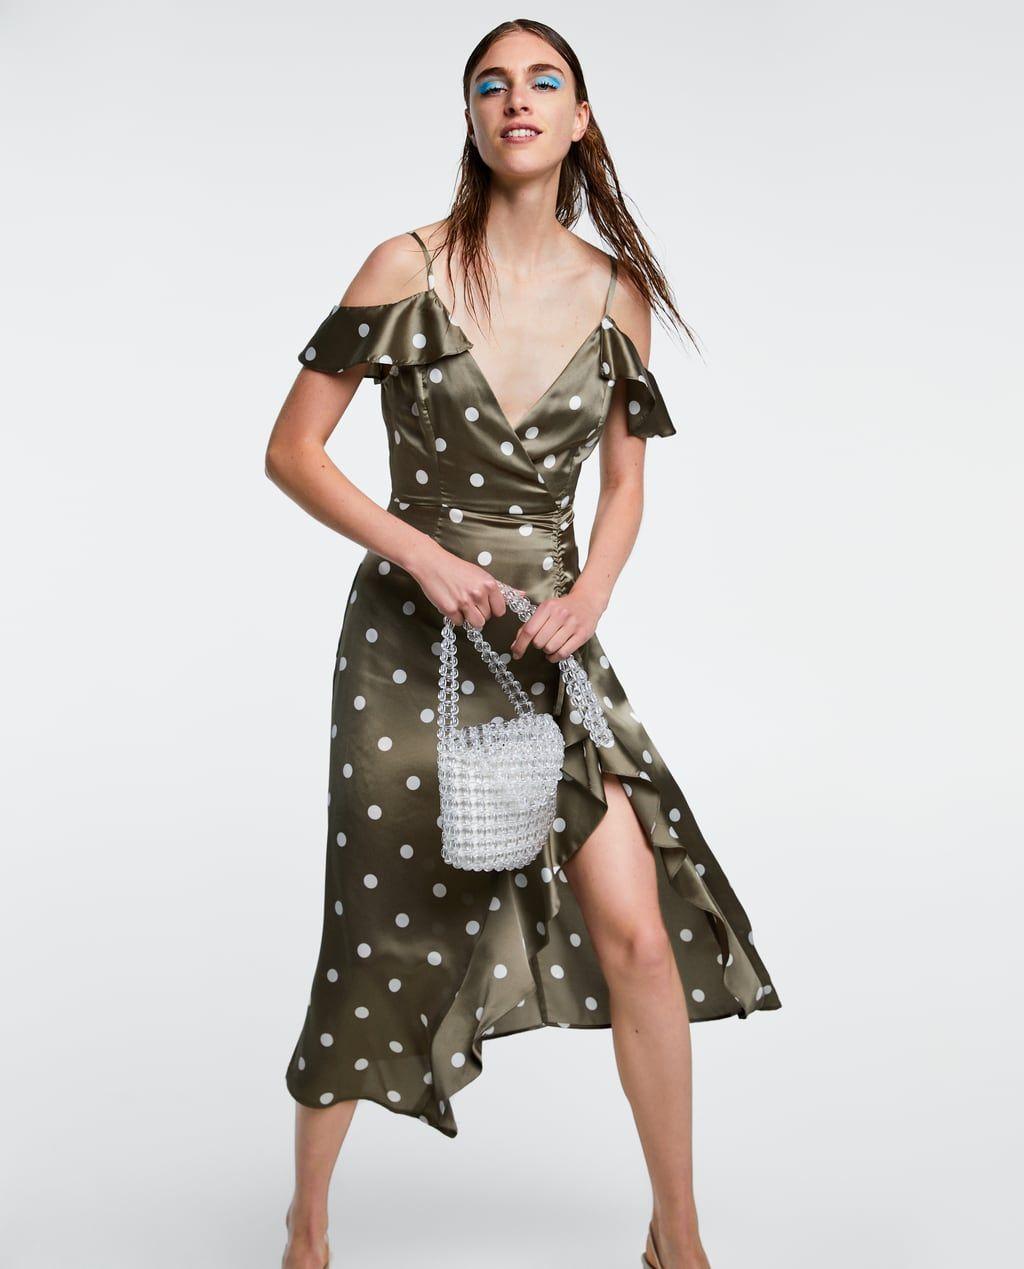 eb1db24dc43 Image 5 of POLKA DOT DRESS from Zara